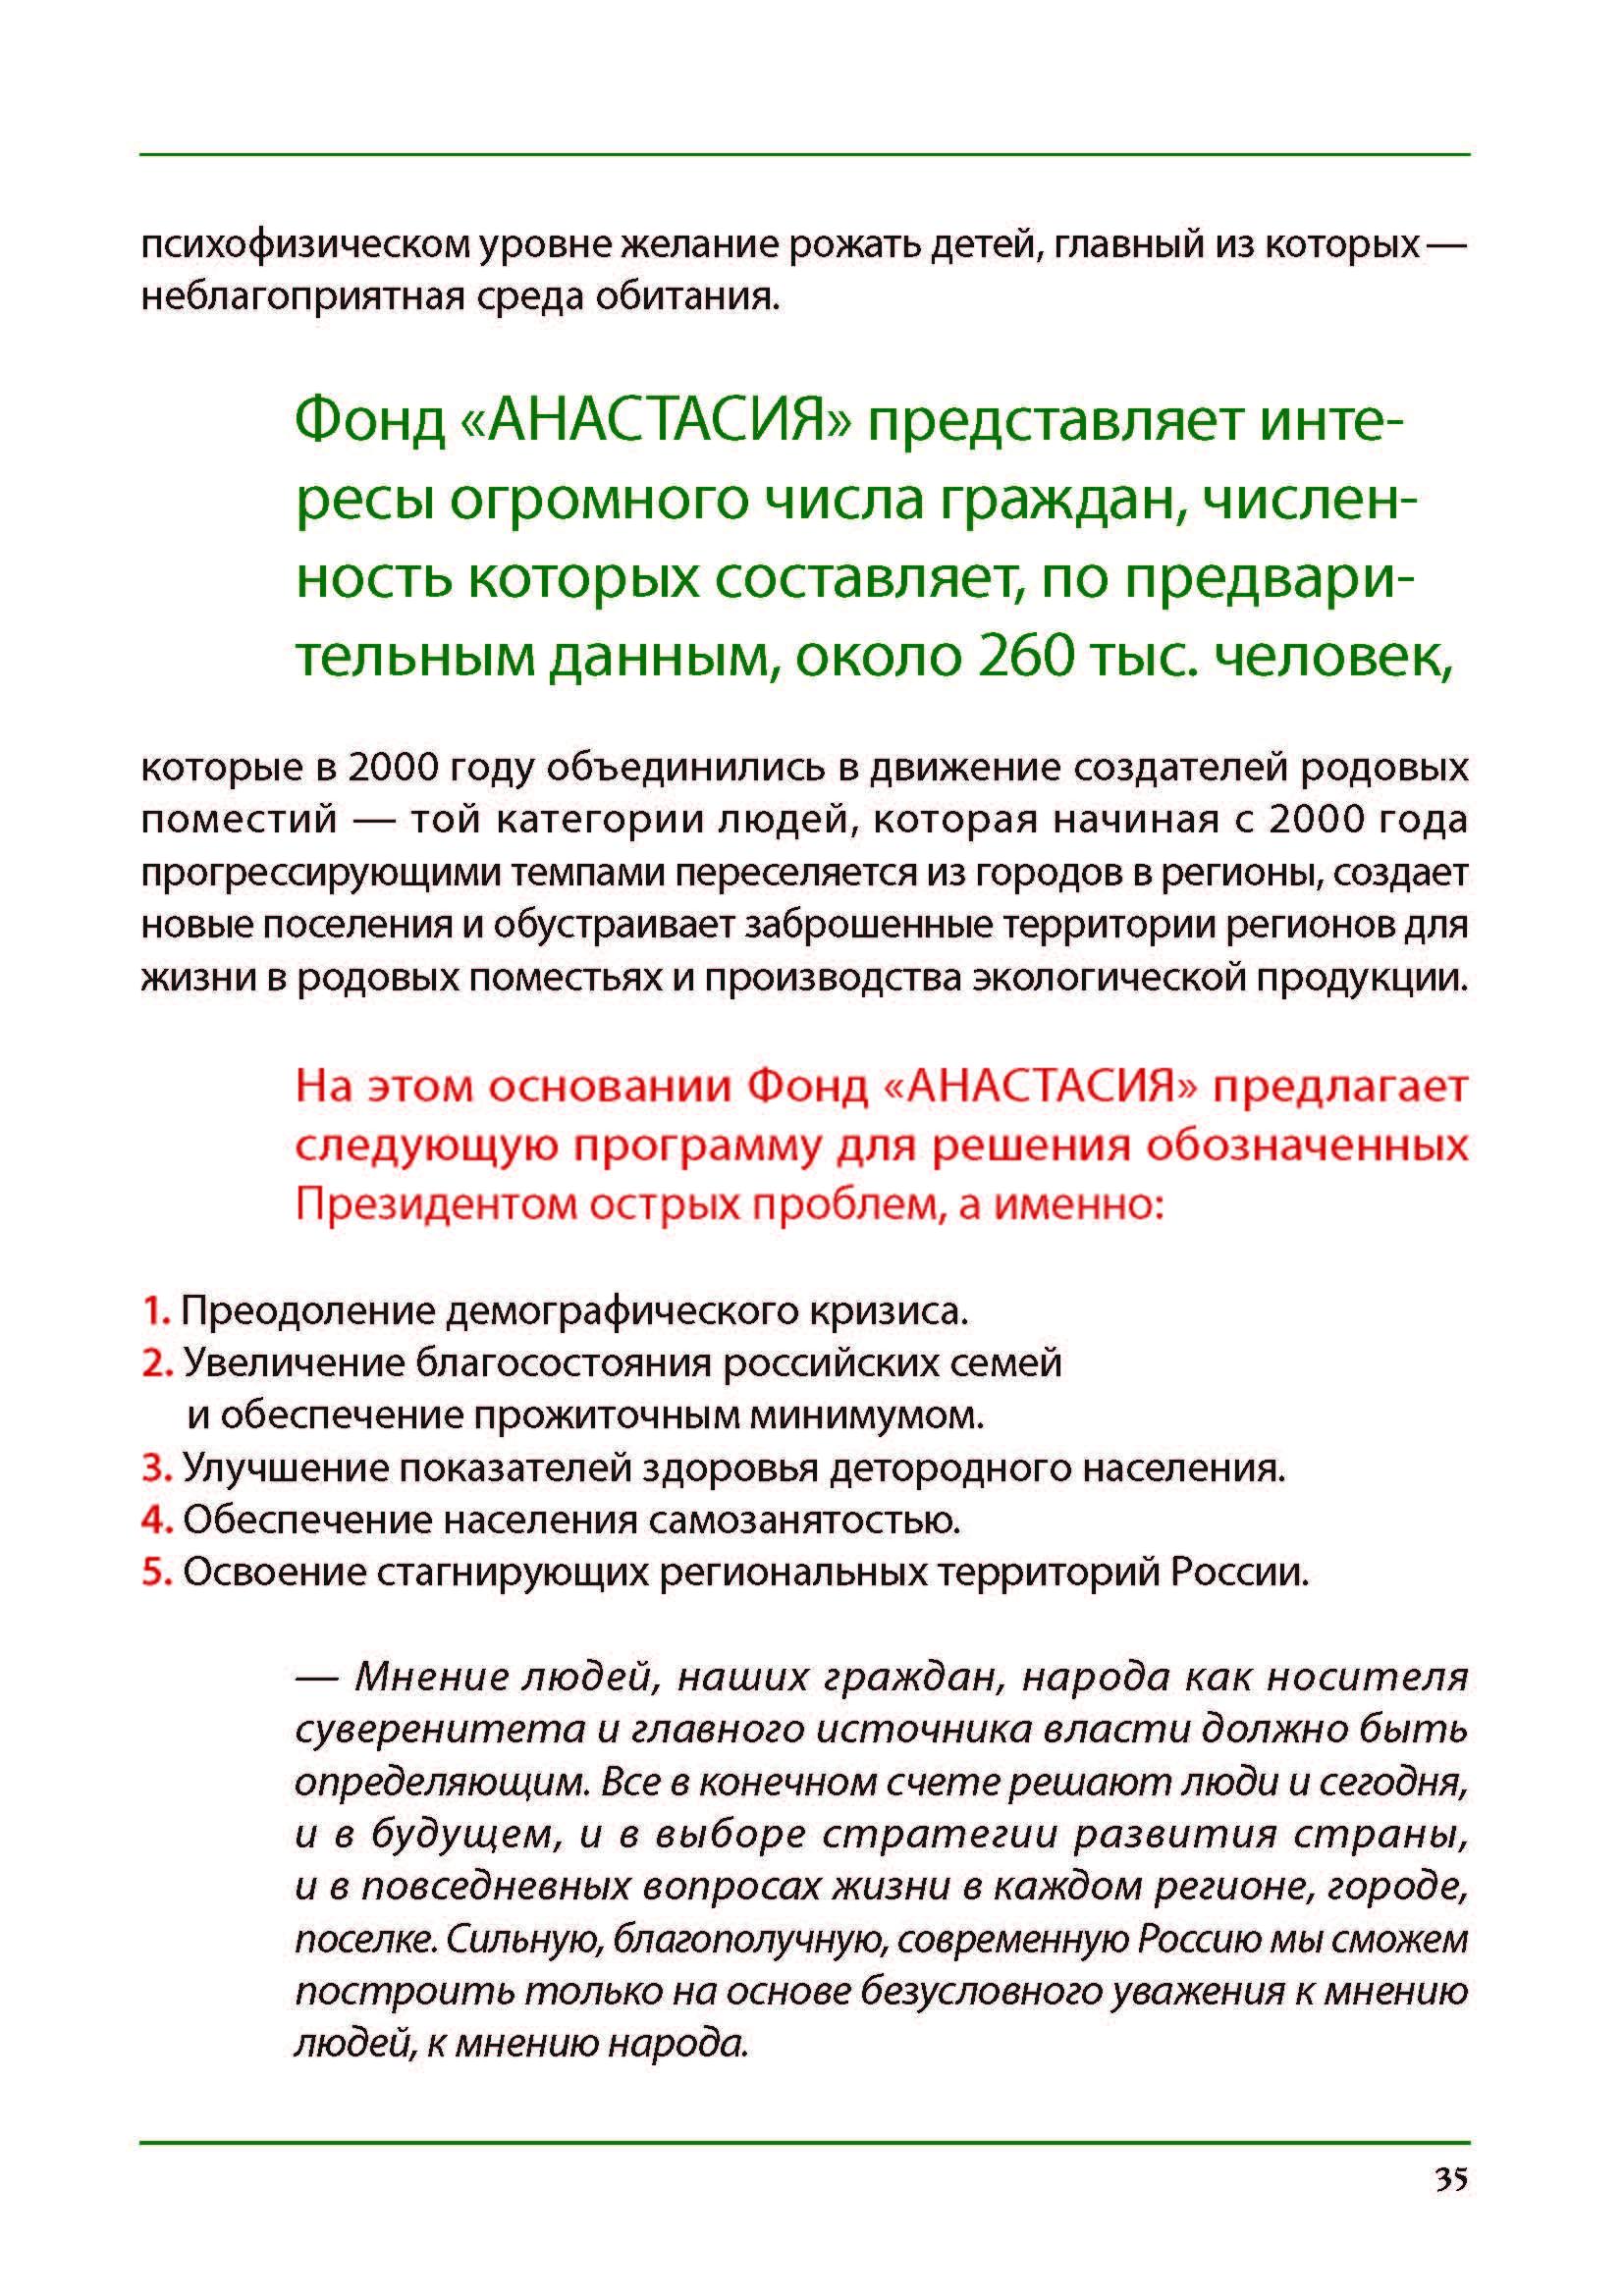 Фонд Поправка Конституция (35).jpg